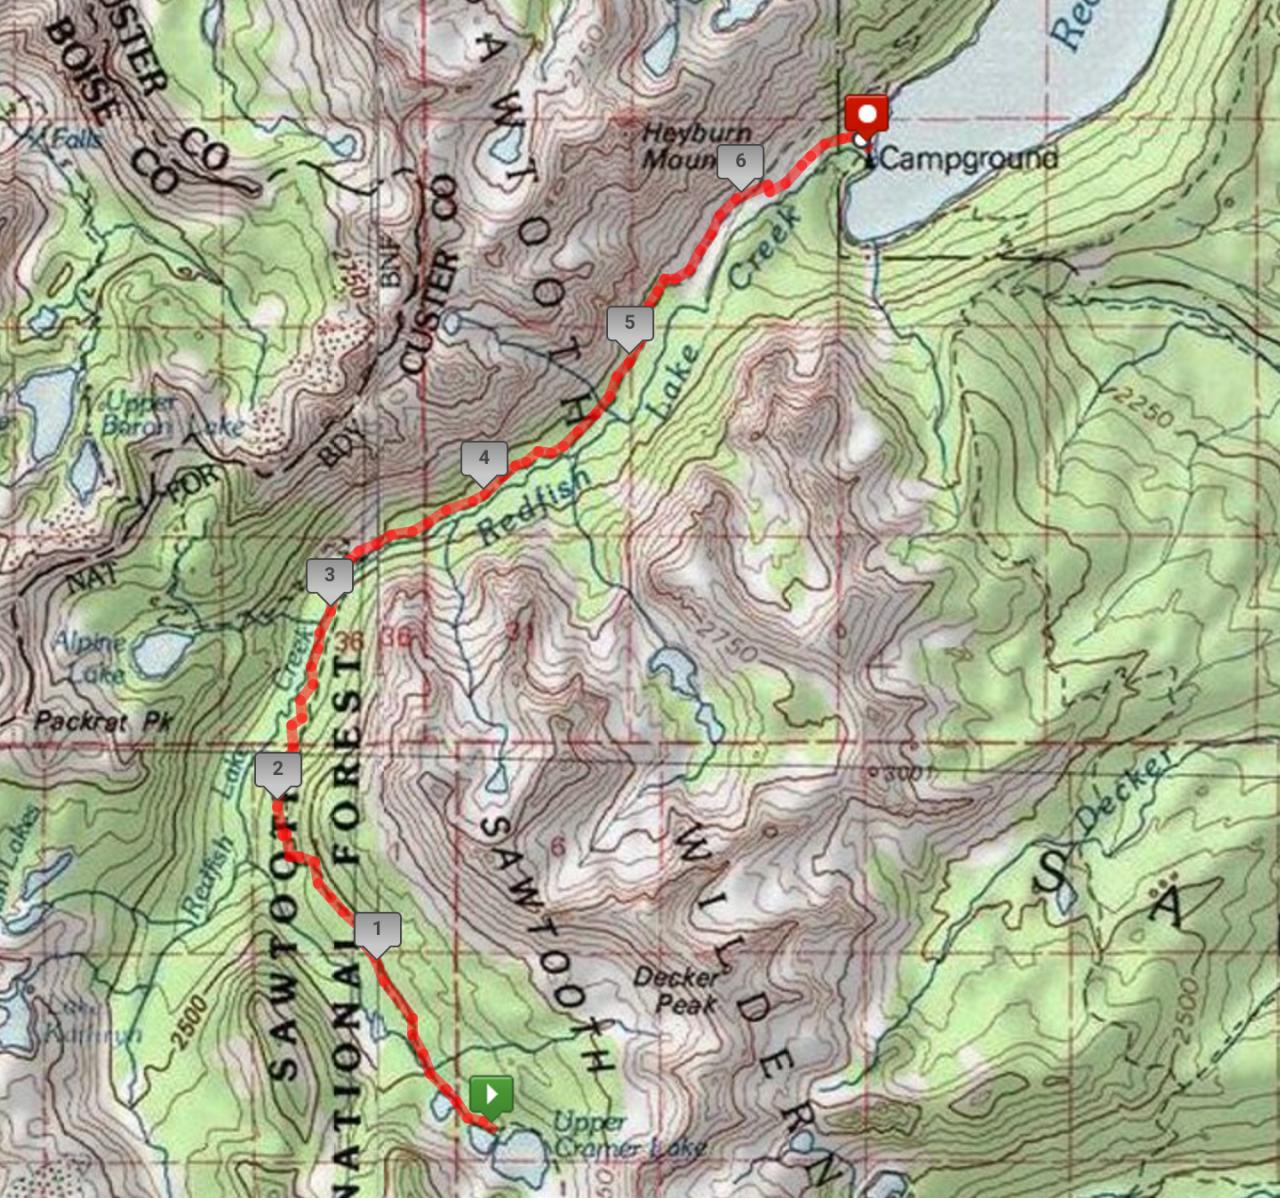 A Second Sawtooth Adventure | Backcountry Sights on mount washington hiking trail map, red trail map, coconino trail map, phoenix trail map, oak forest trail map, river to river trail map, targhee trail map, payette national forest trail map, land between the lakes trail map, owyhee trail map, raven rock trail map, jefferson trail map, moosalamoo trail map, idaho atv trail map, water trail map, wasatch trail map, weiser trail map, helena trail map, mccall trail map, highland trail map,